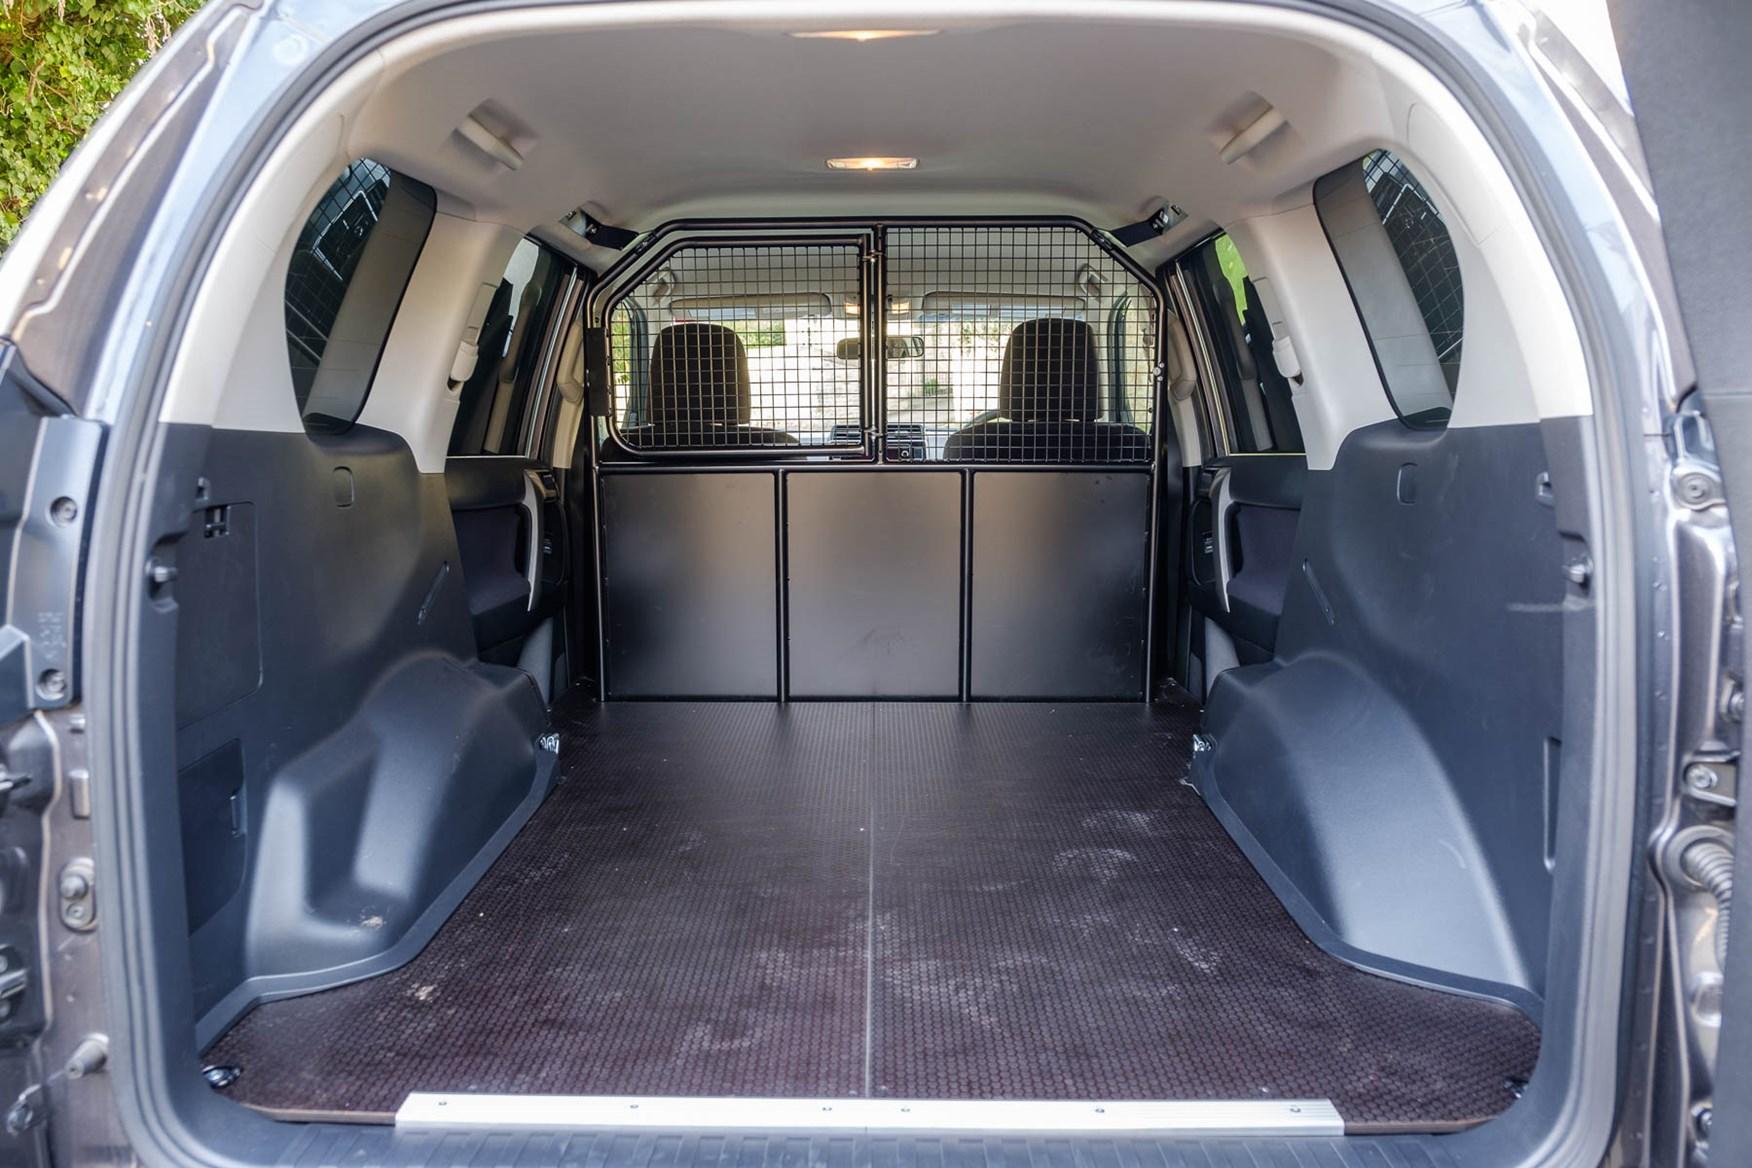 Toyota Land Cruiser Utility Commercial LWB interior